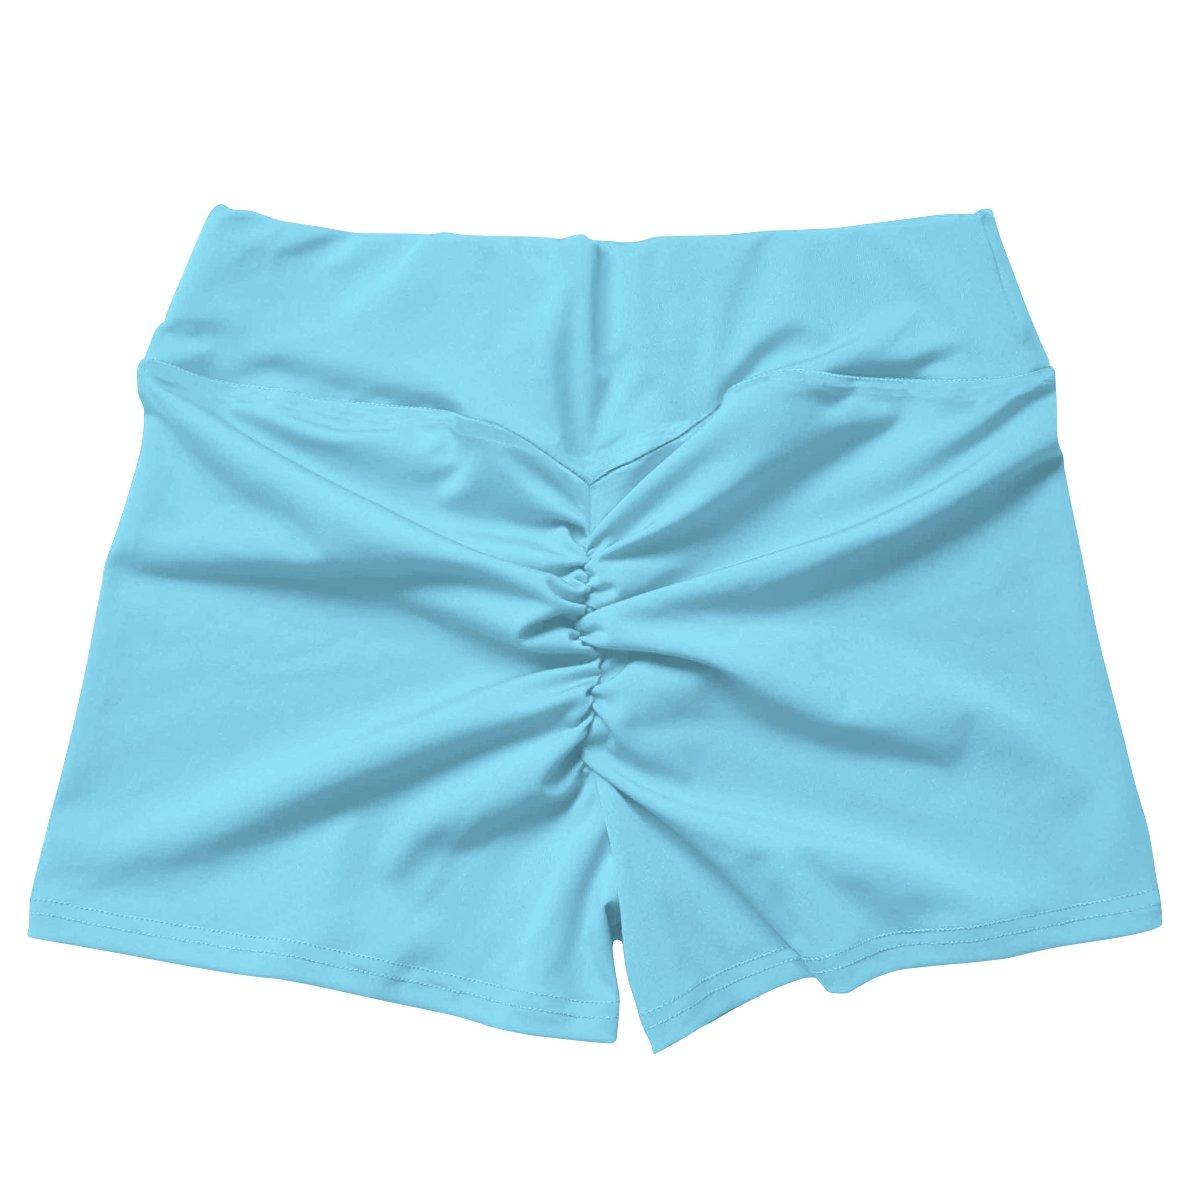 gaara summer active wear set 743380 - Anime Swimsuits